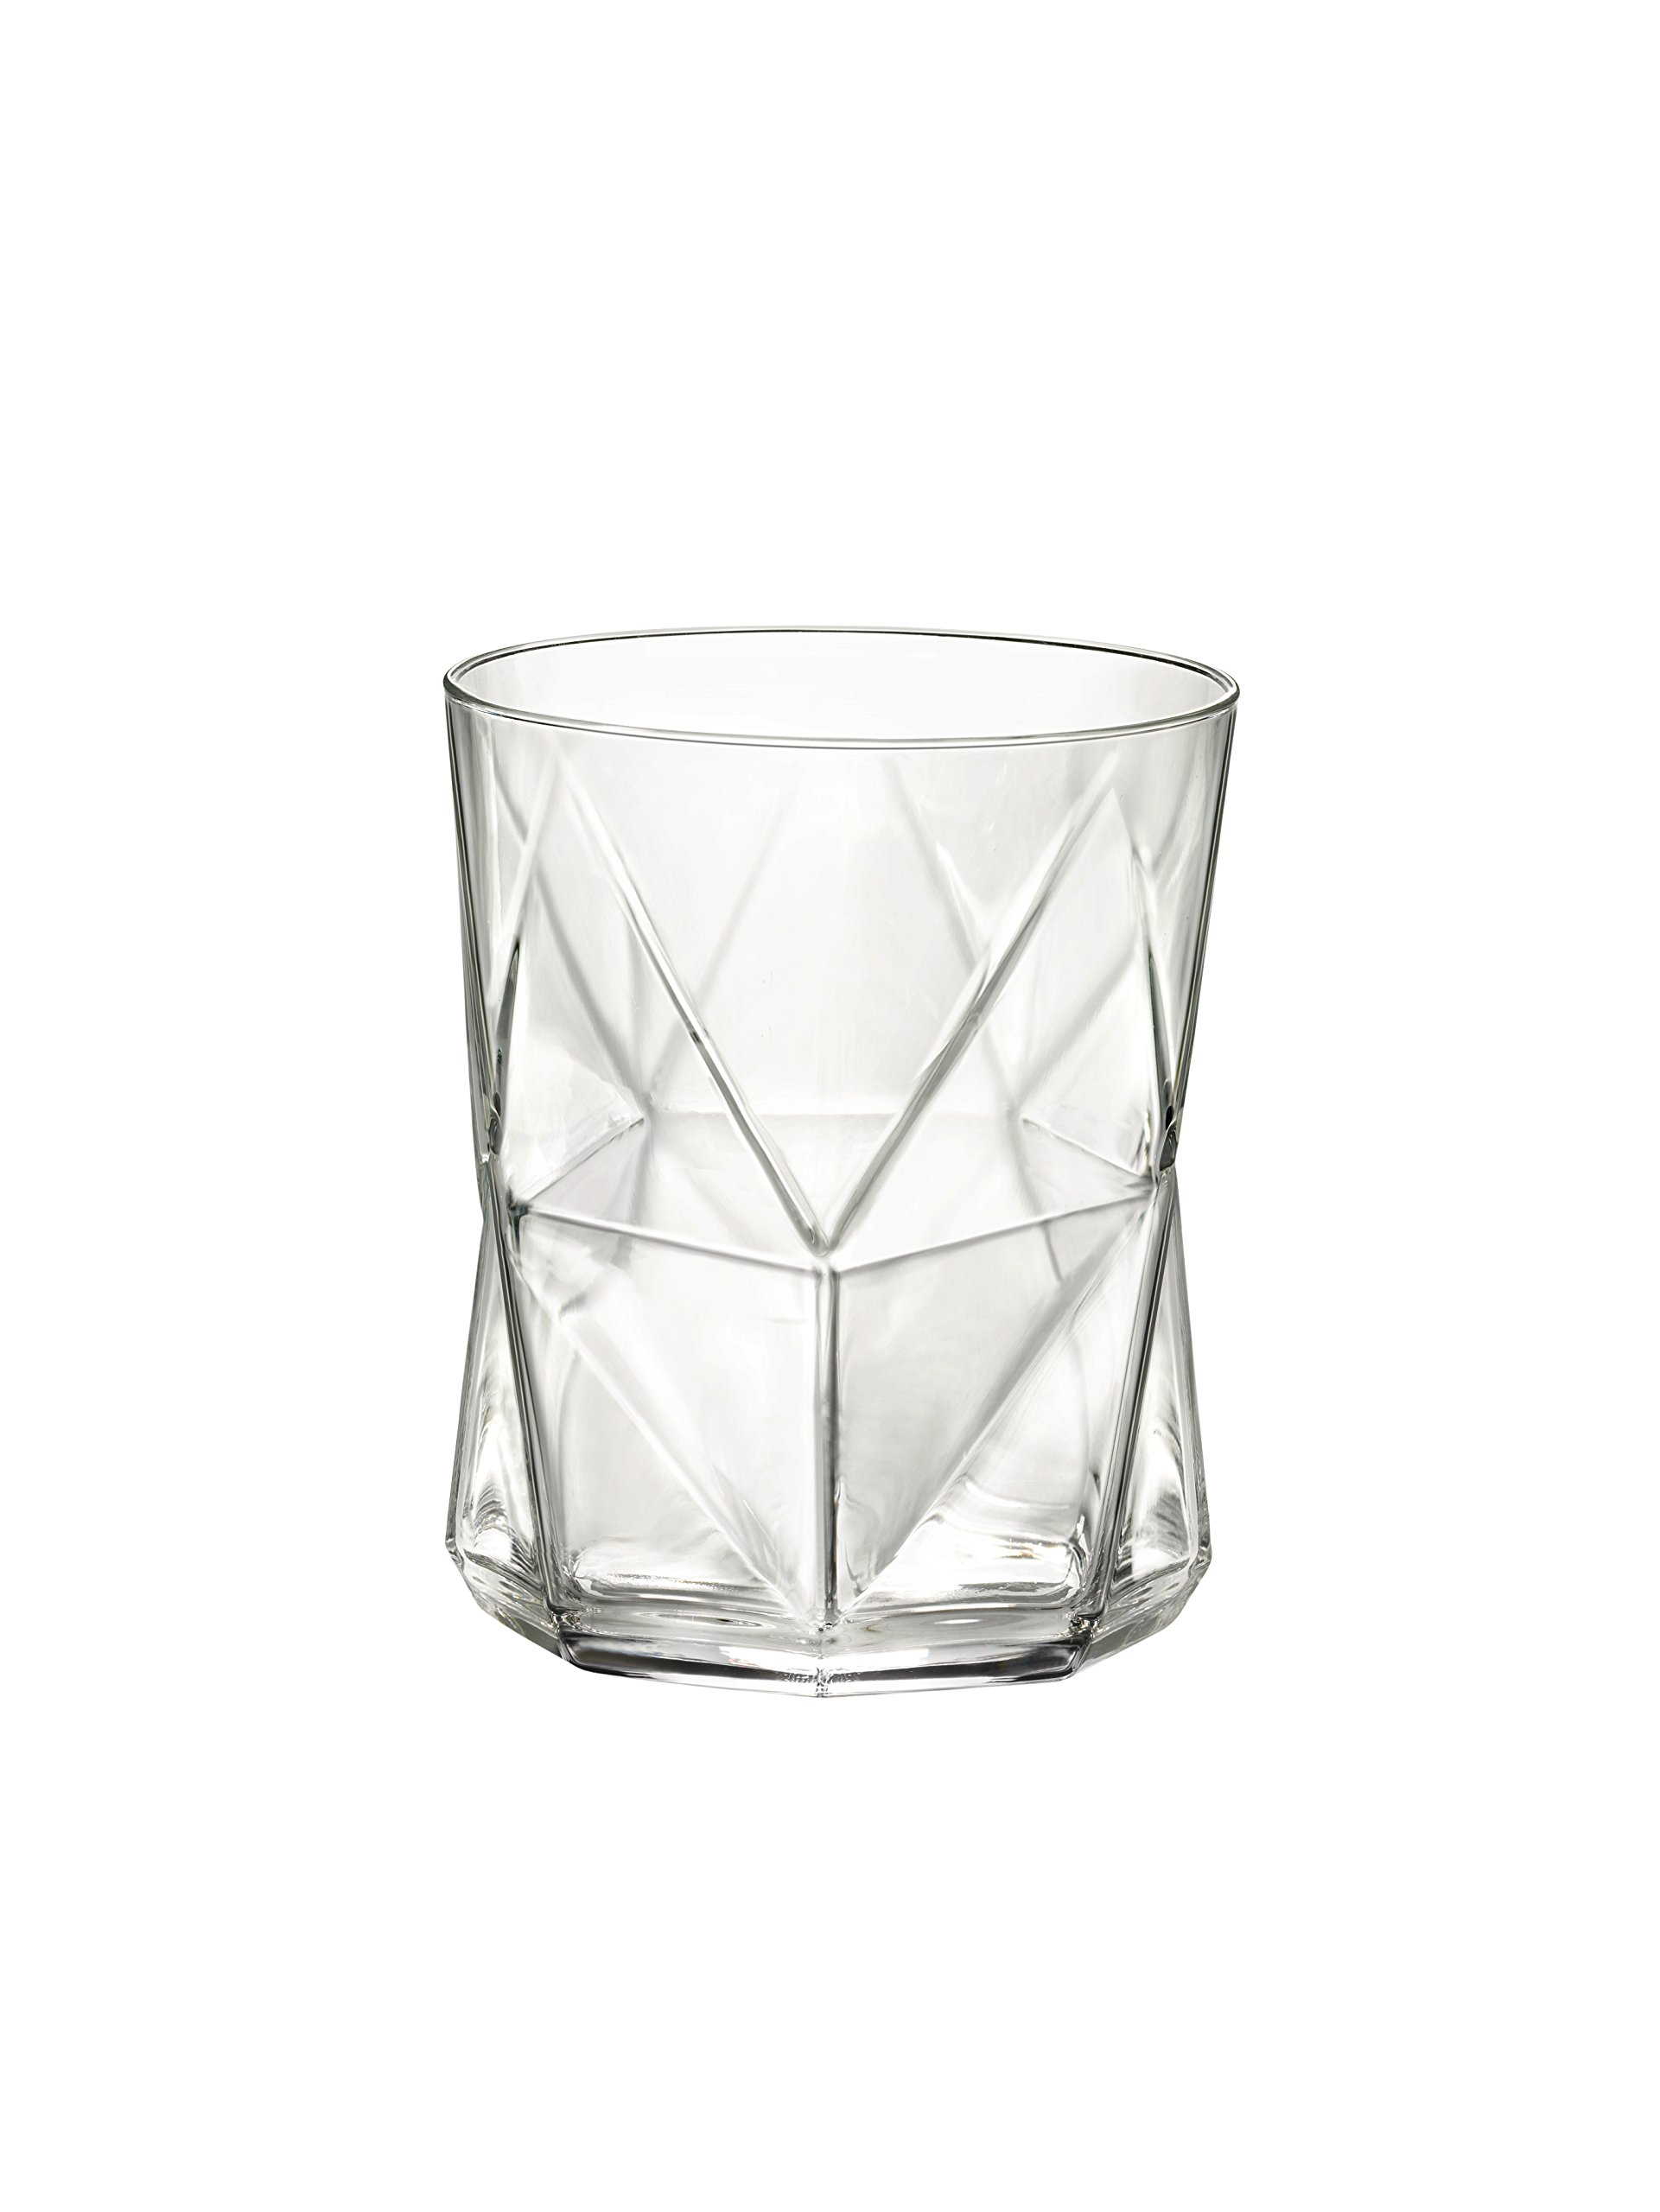 Bormioli Rocco Cassiopea Double Old Fashioned Glass, Set of 4